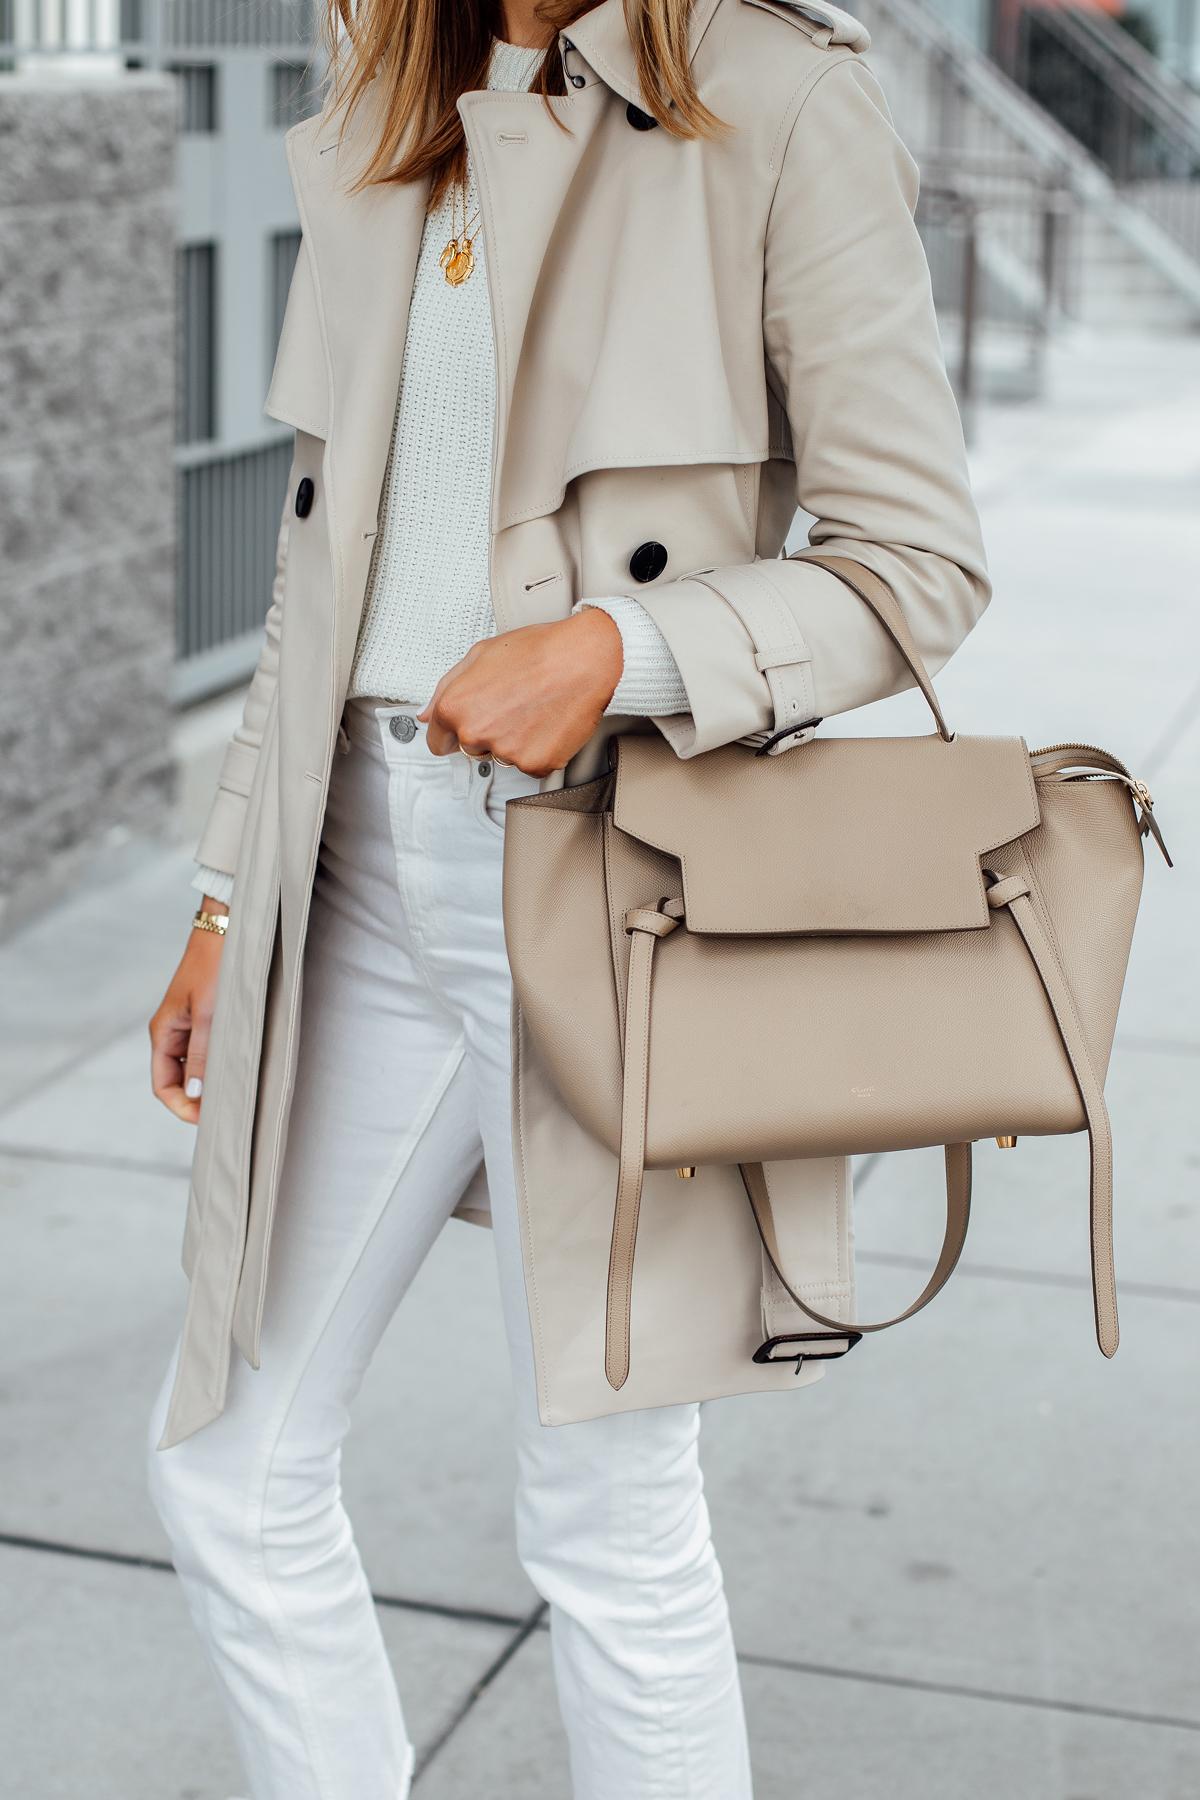 Woman Wearing Club Monaco Trench Coat White Sweater White Jeans Celine Mini Belt Bag Fashion Jackson San Diego Fashion Blogger Street Style